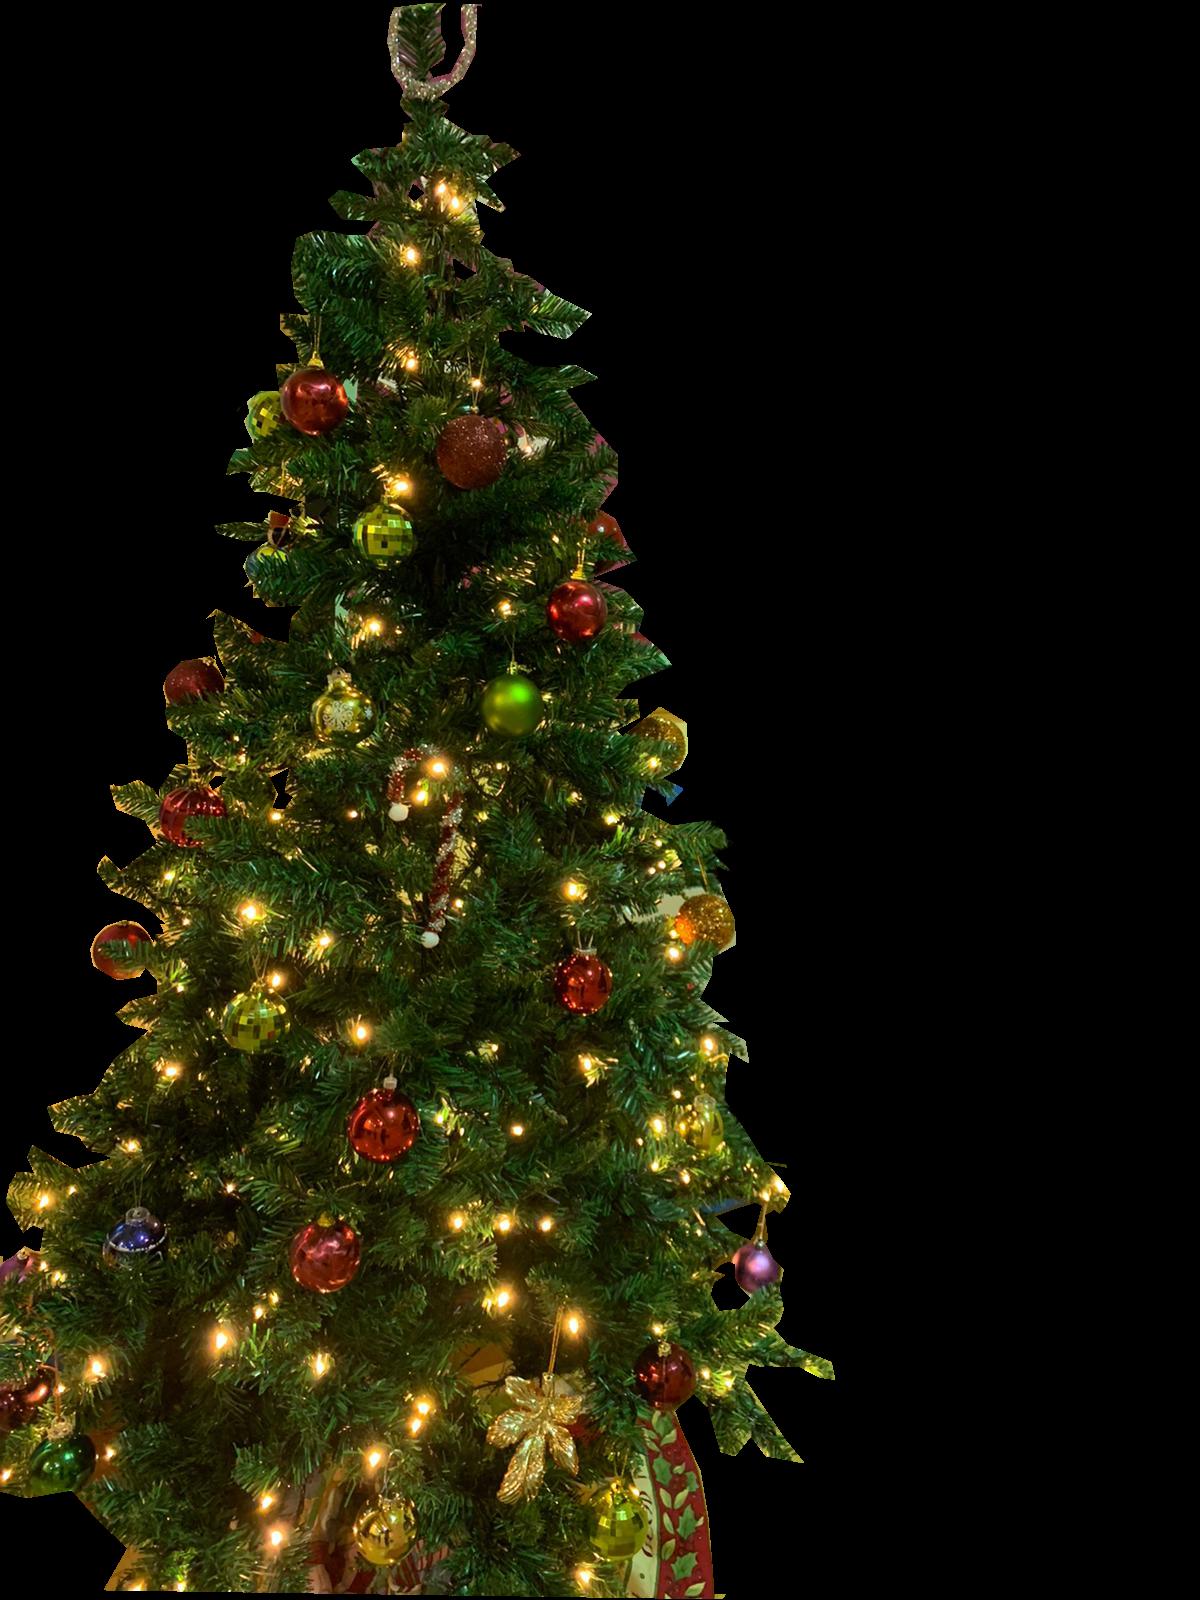 ChristmasTree_Cutout